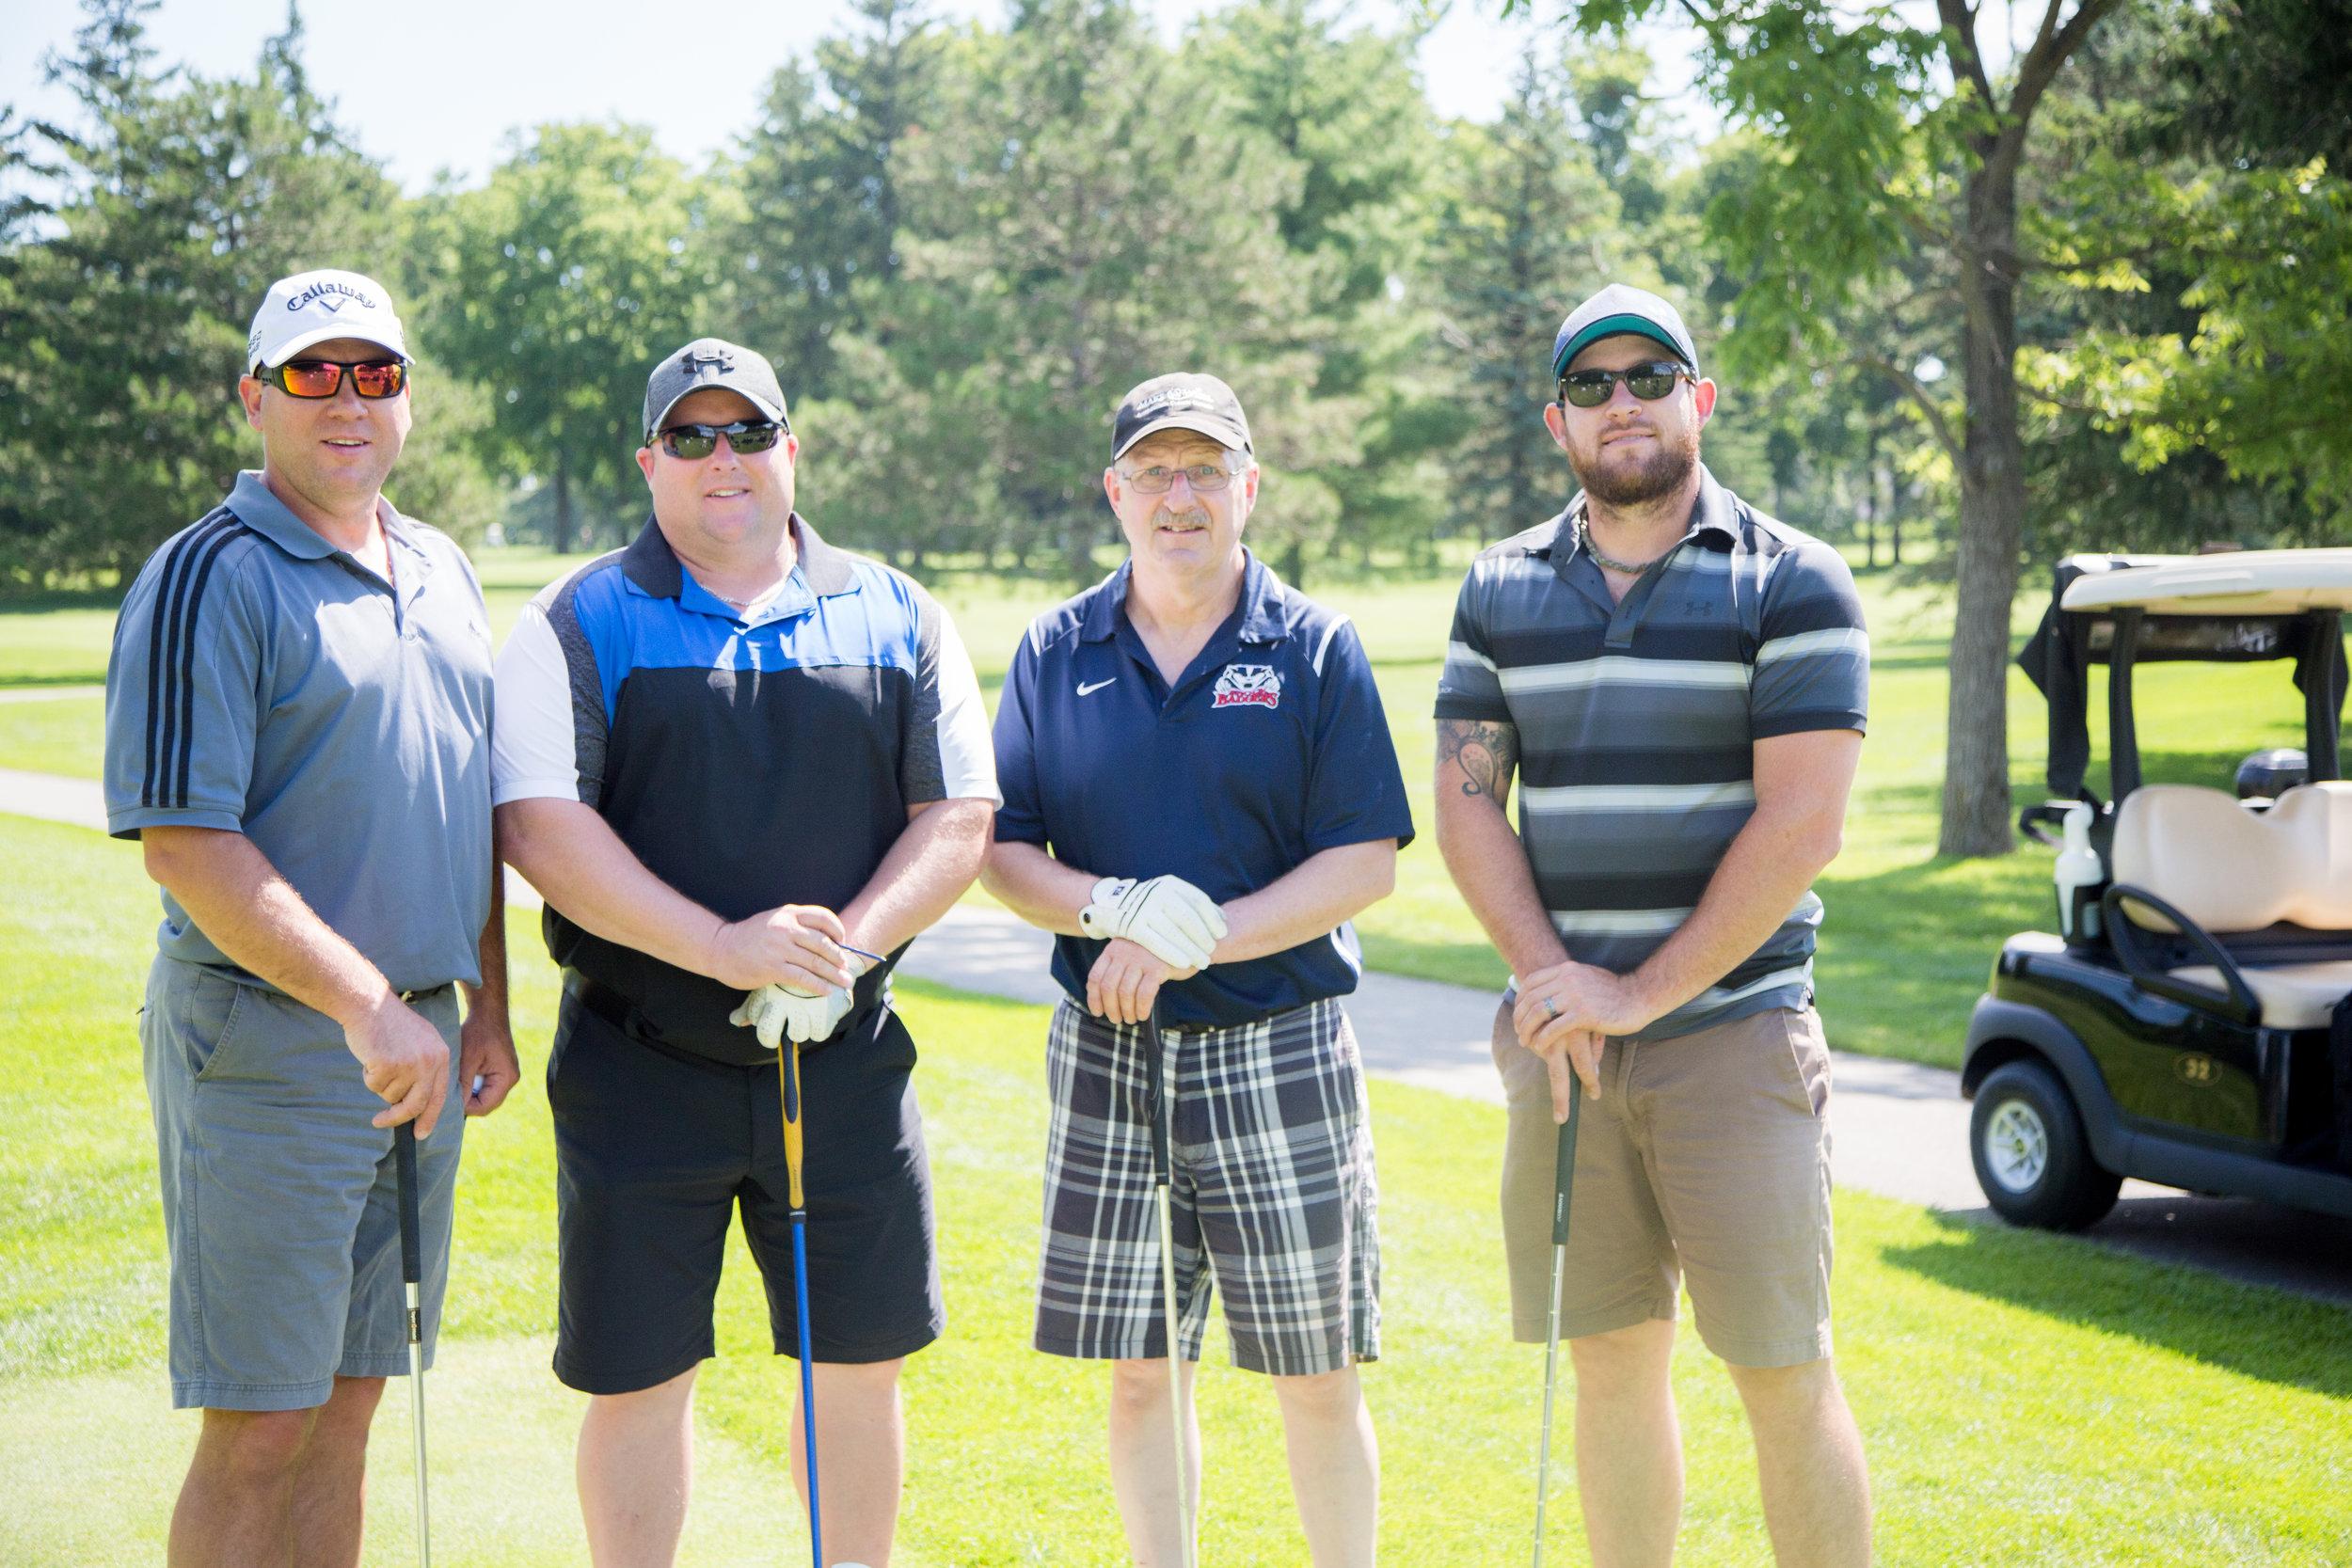 Make A Wish Golf Classic 2018 - Team Brodie -